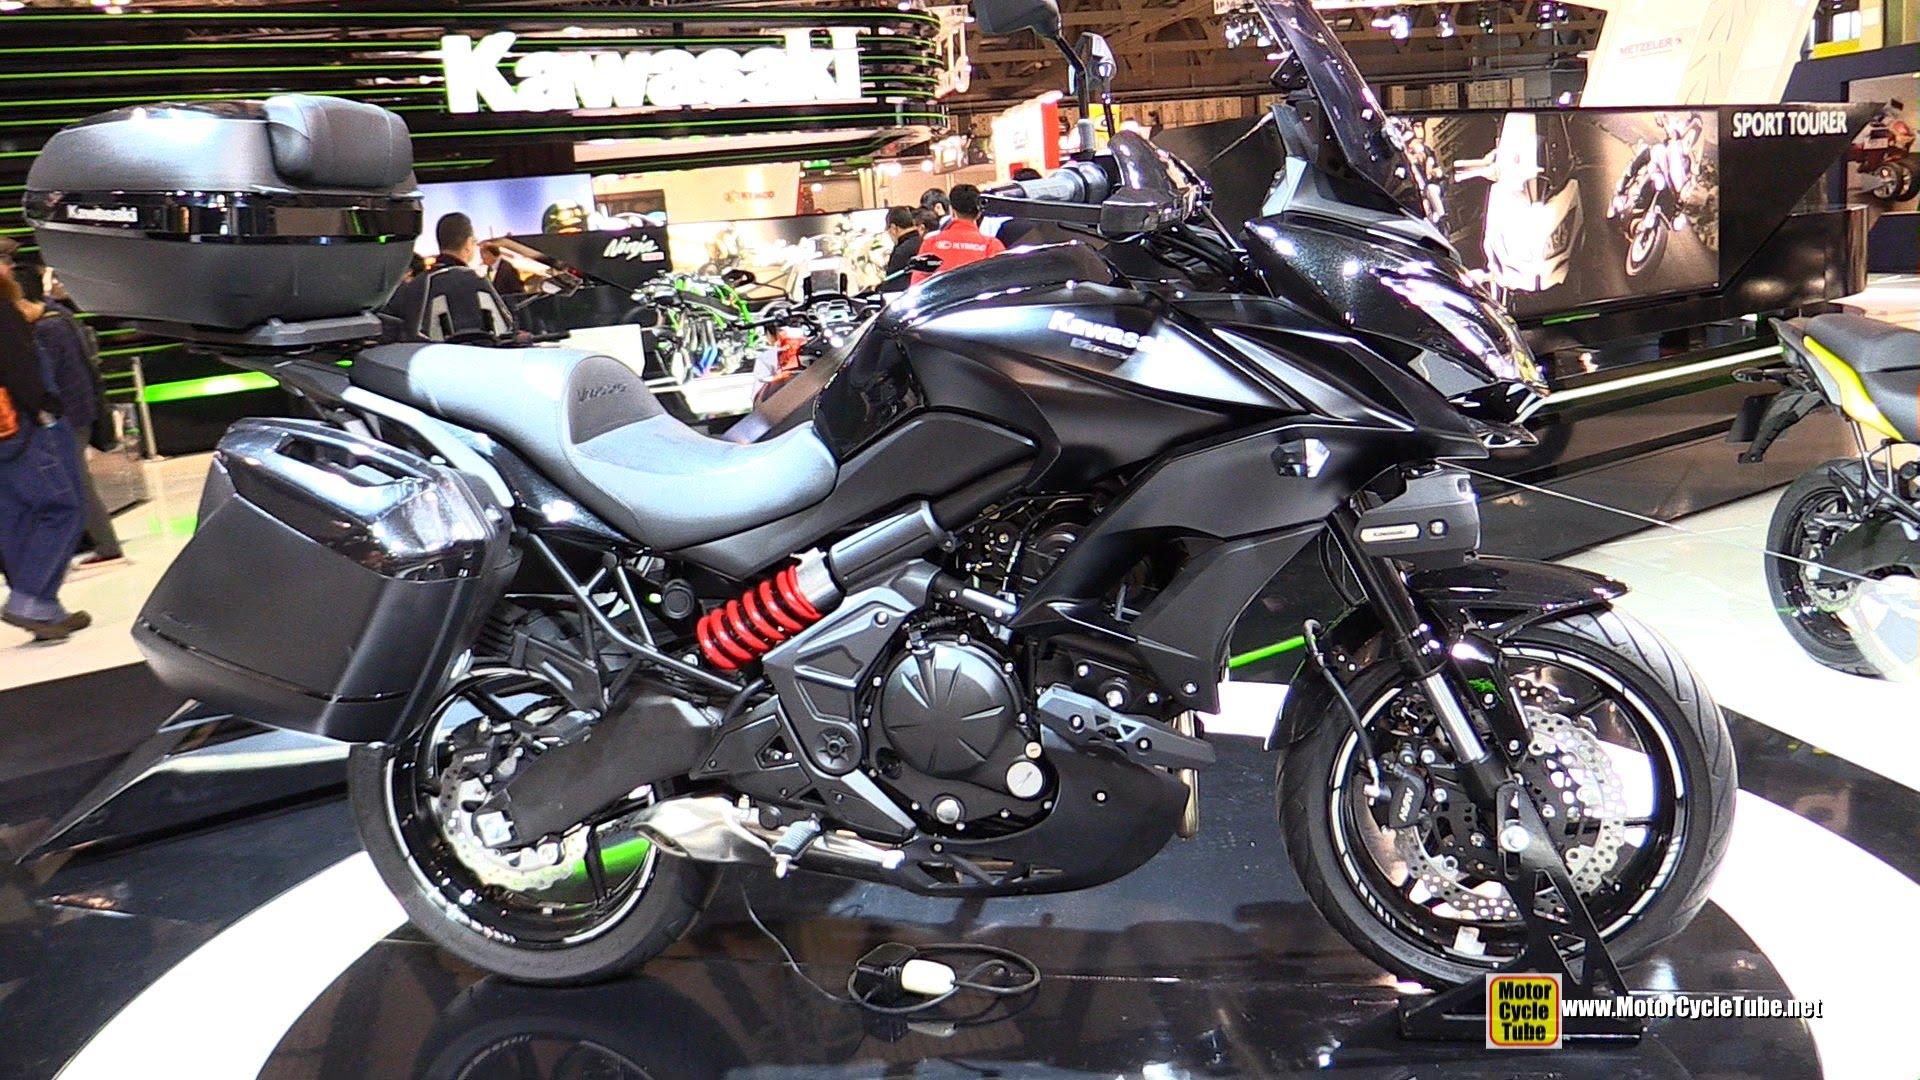 2016 Kawasaki Versys 650 ABS: Price, Specs, Details | AutoColumn